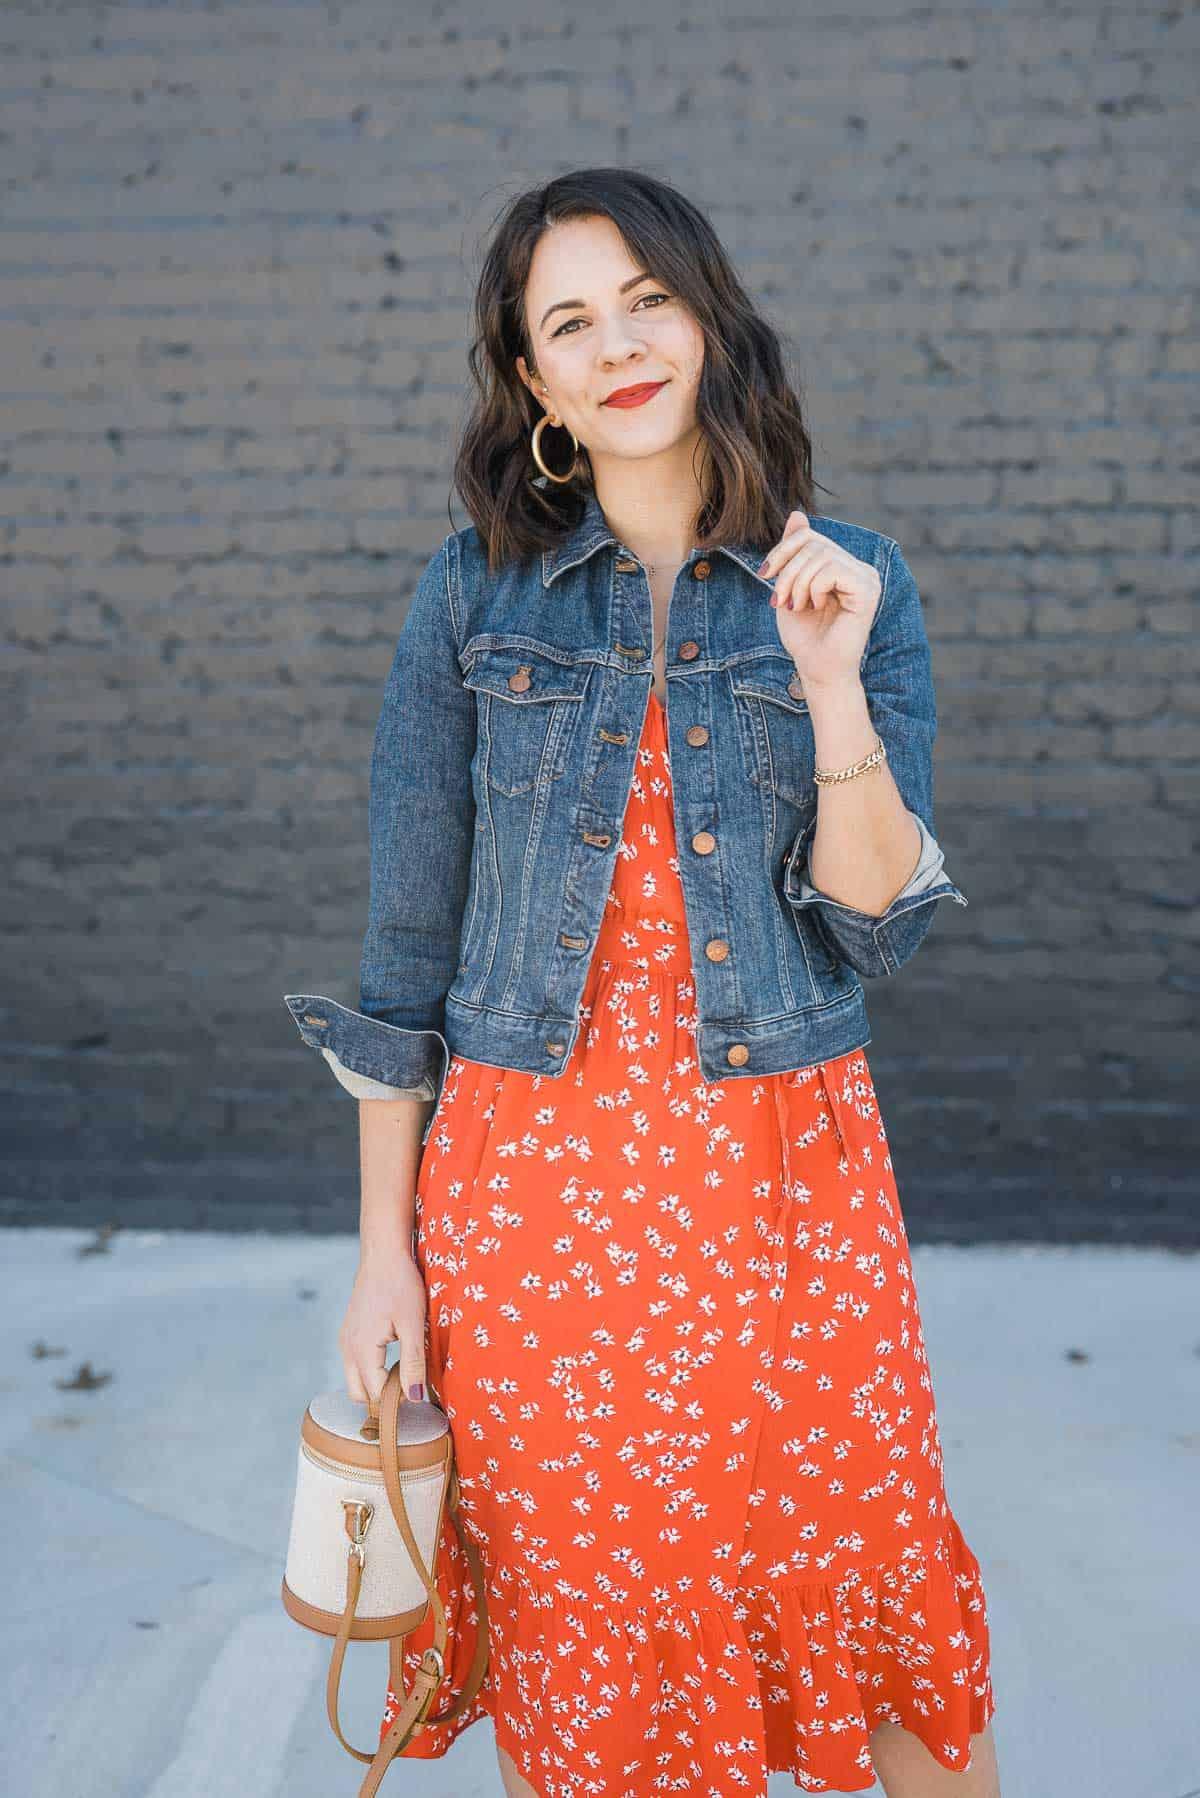 Joules red midi dress floral print